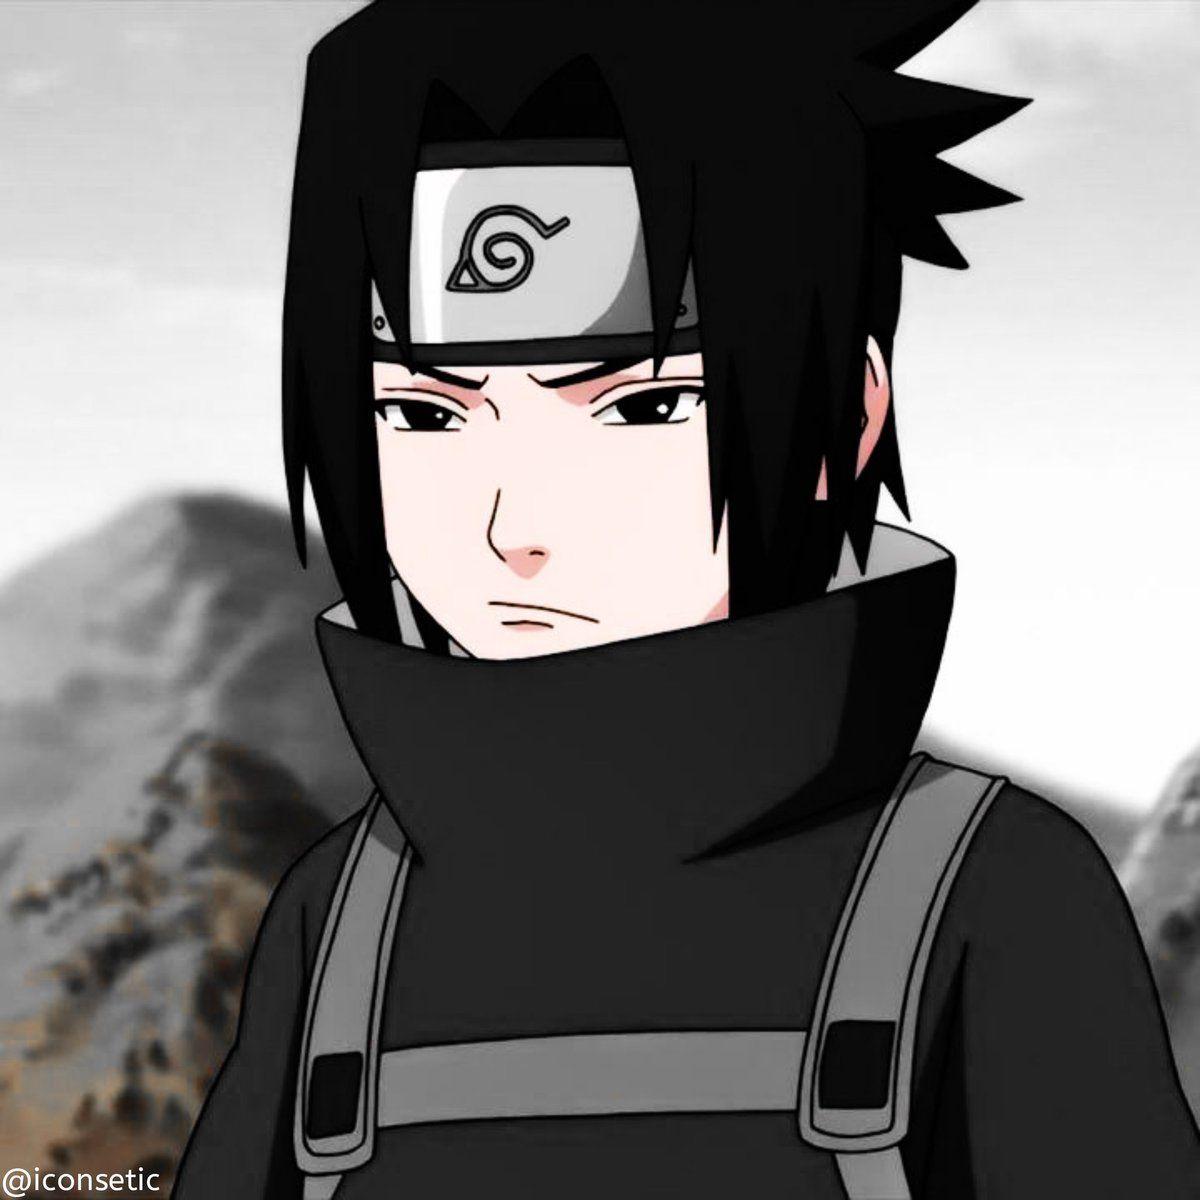 Pin By 𝒃𝒙𝒃𝒚𝒈𝒊𝒓𝒍 On Anime Naruto Shippuden Anime